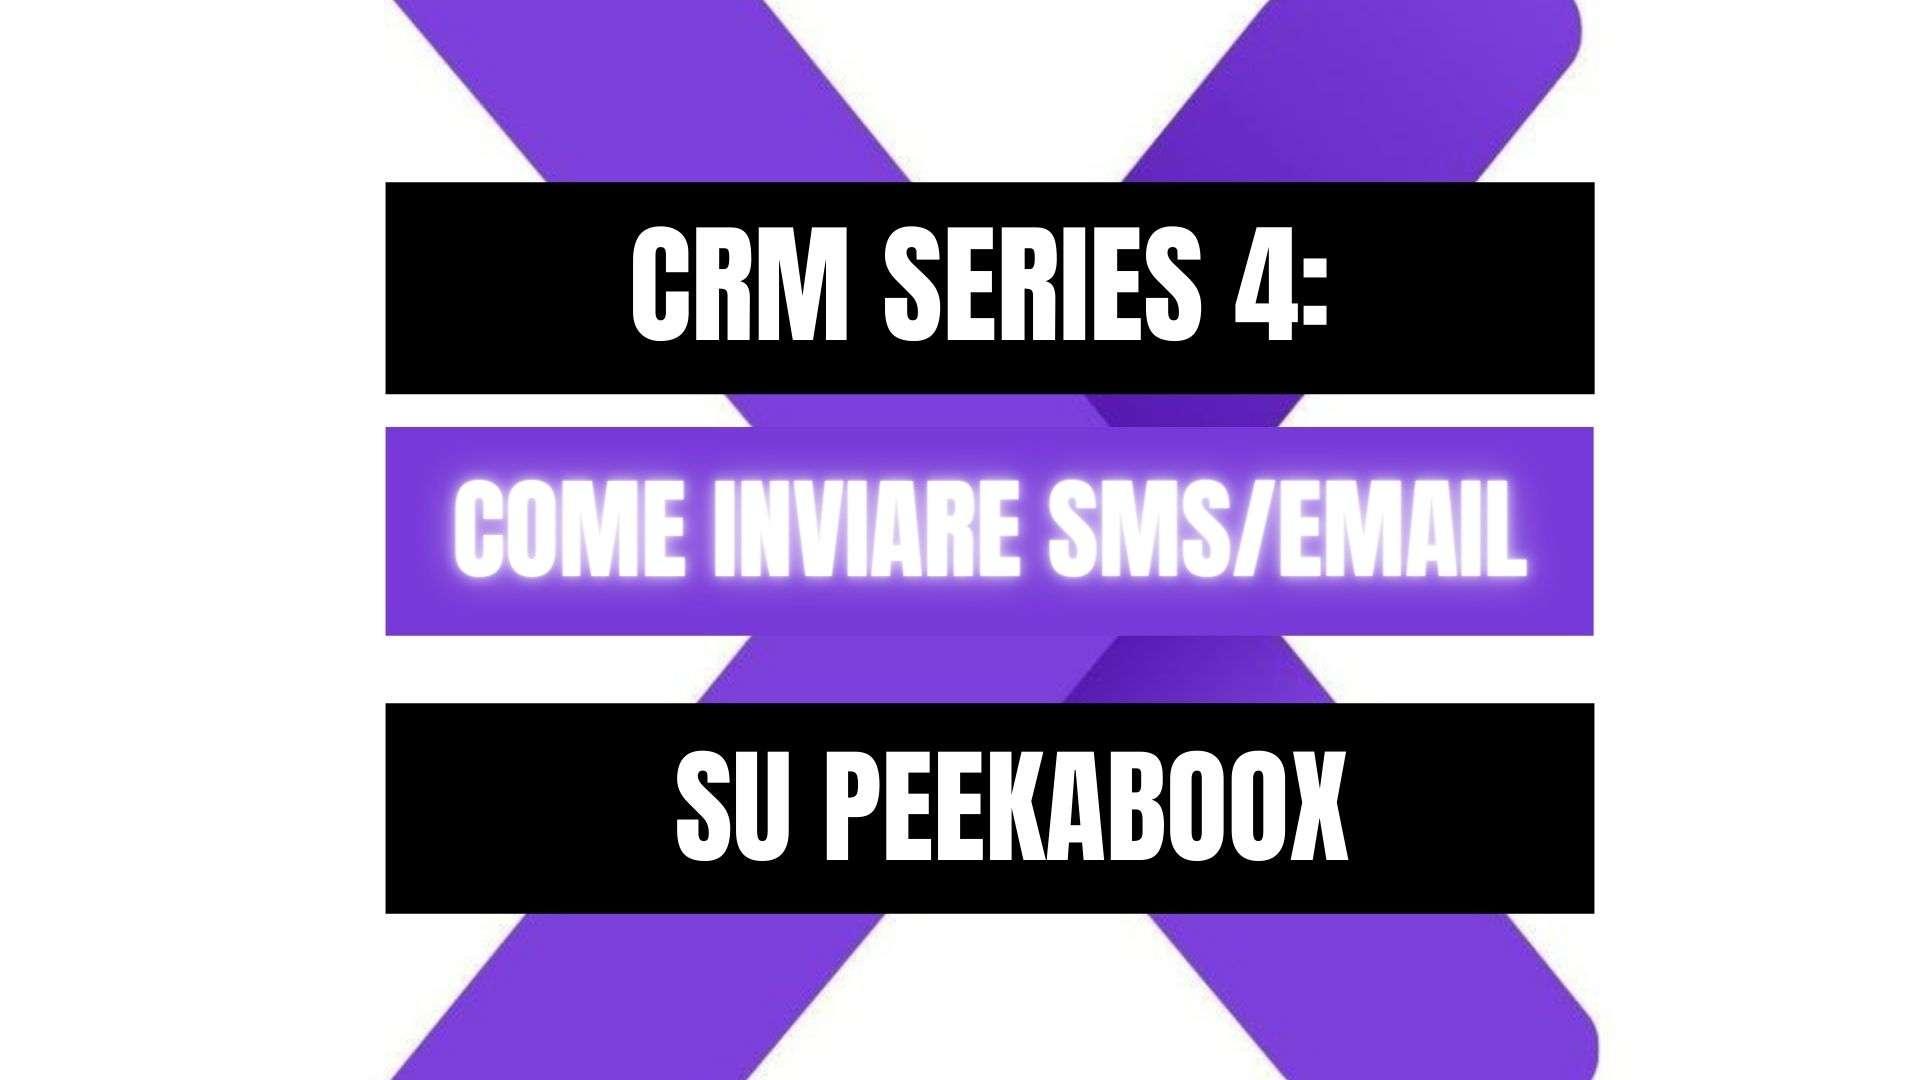 Peekaboox - Come inviare SMS ed email